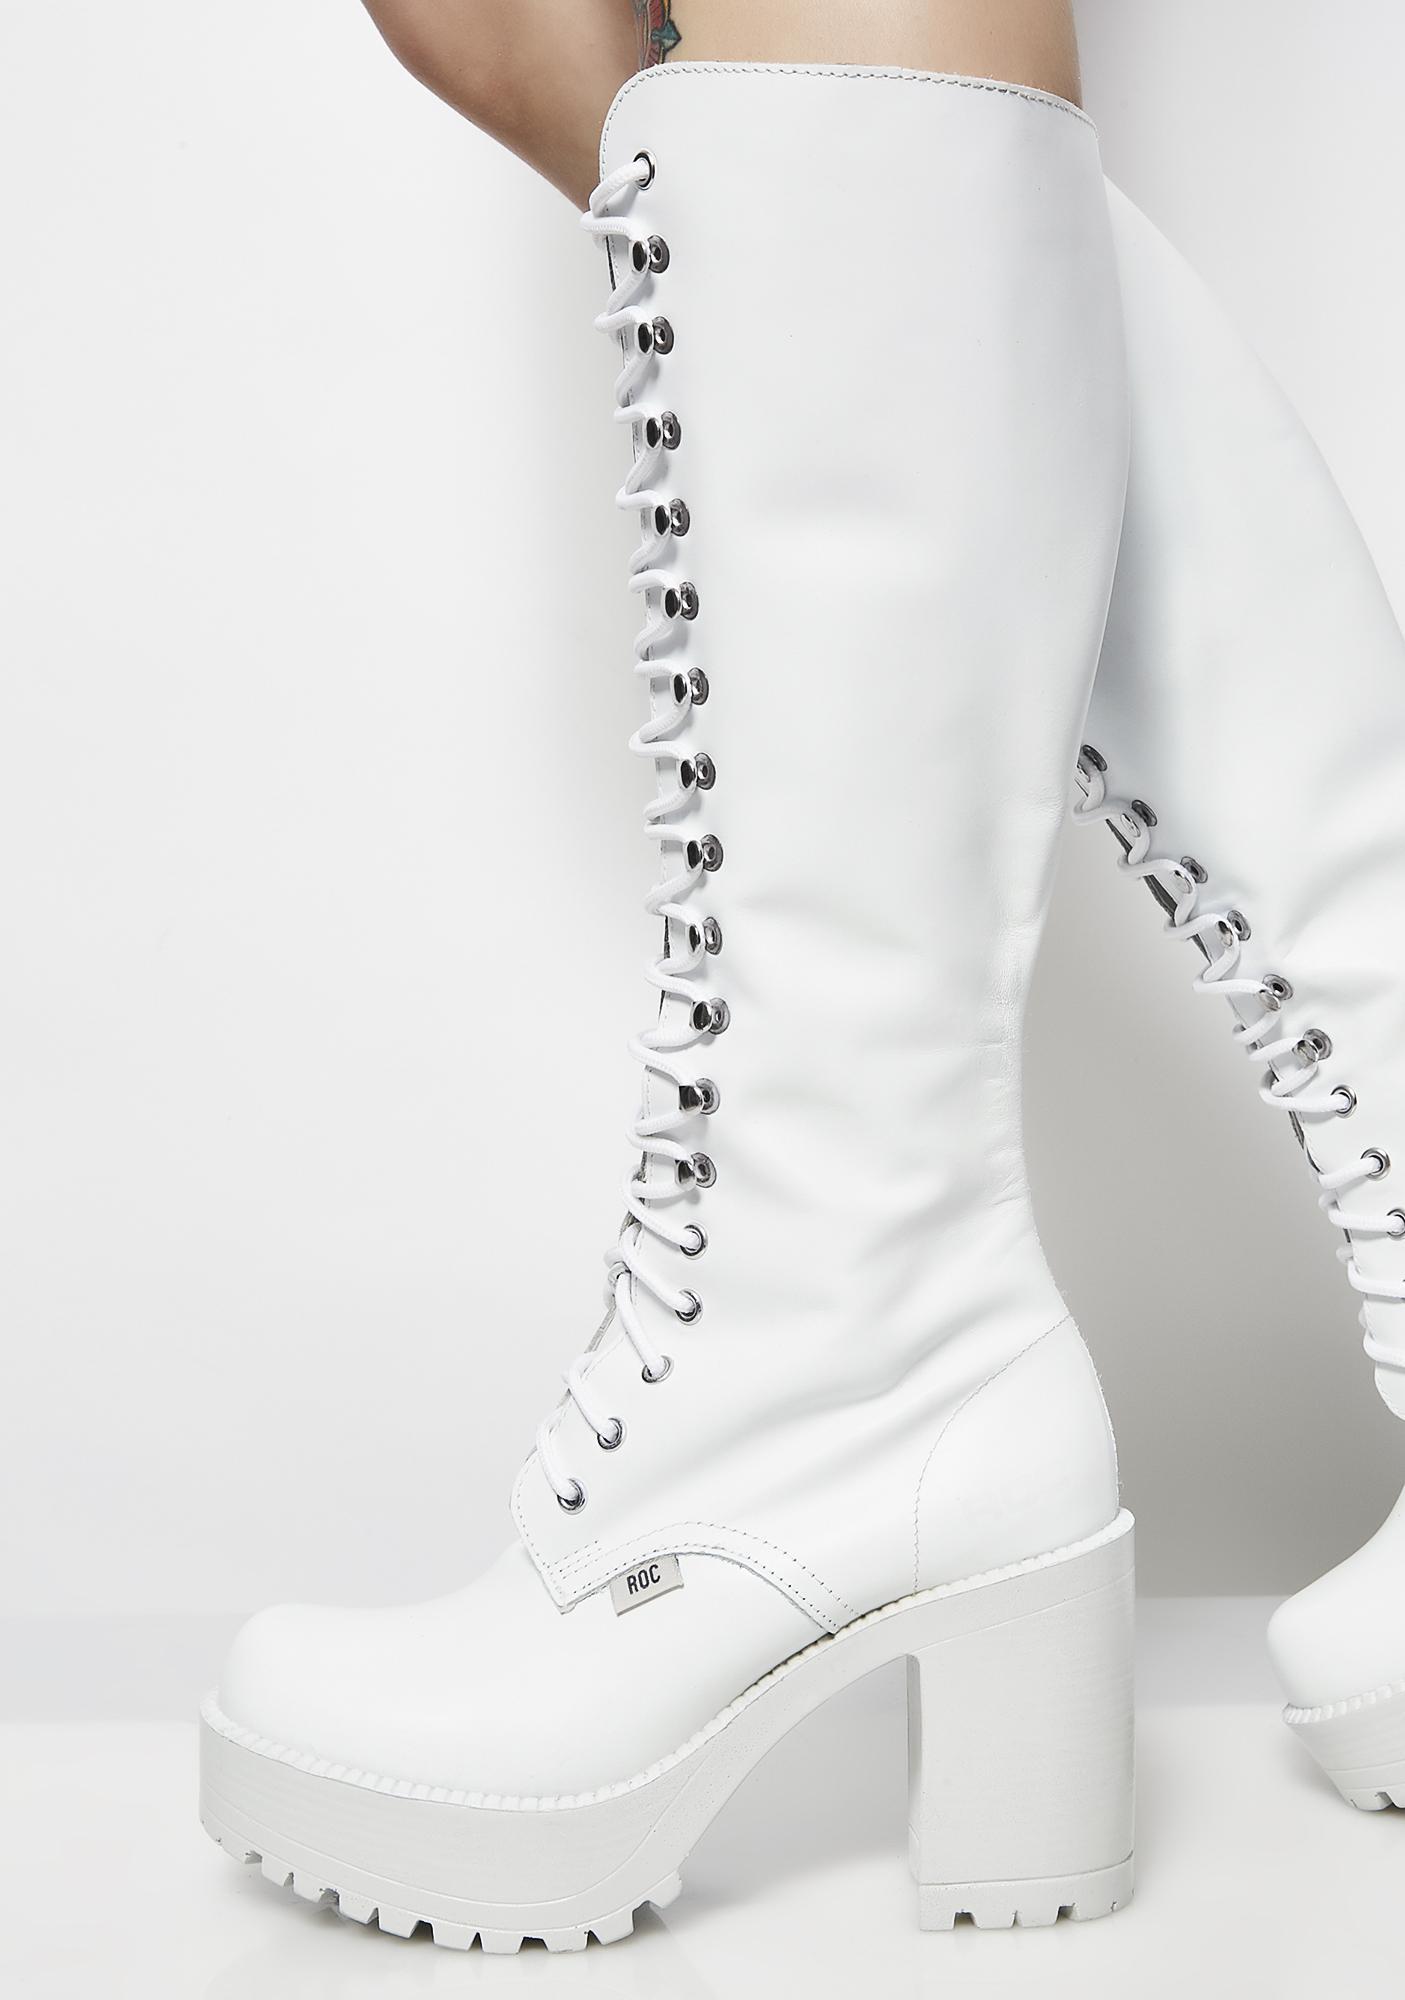 ROC Boots Australia Icy Lash Boots